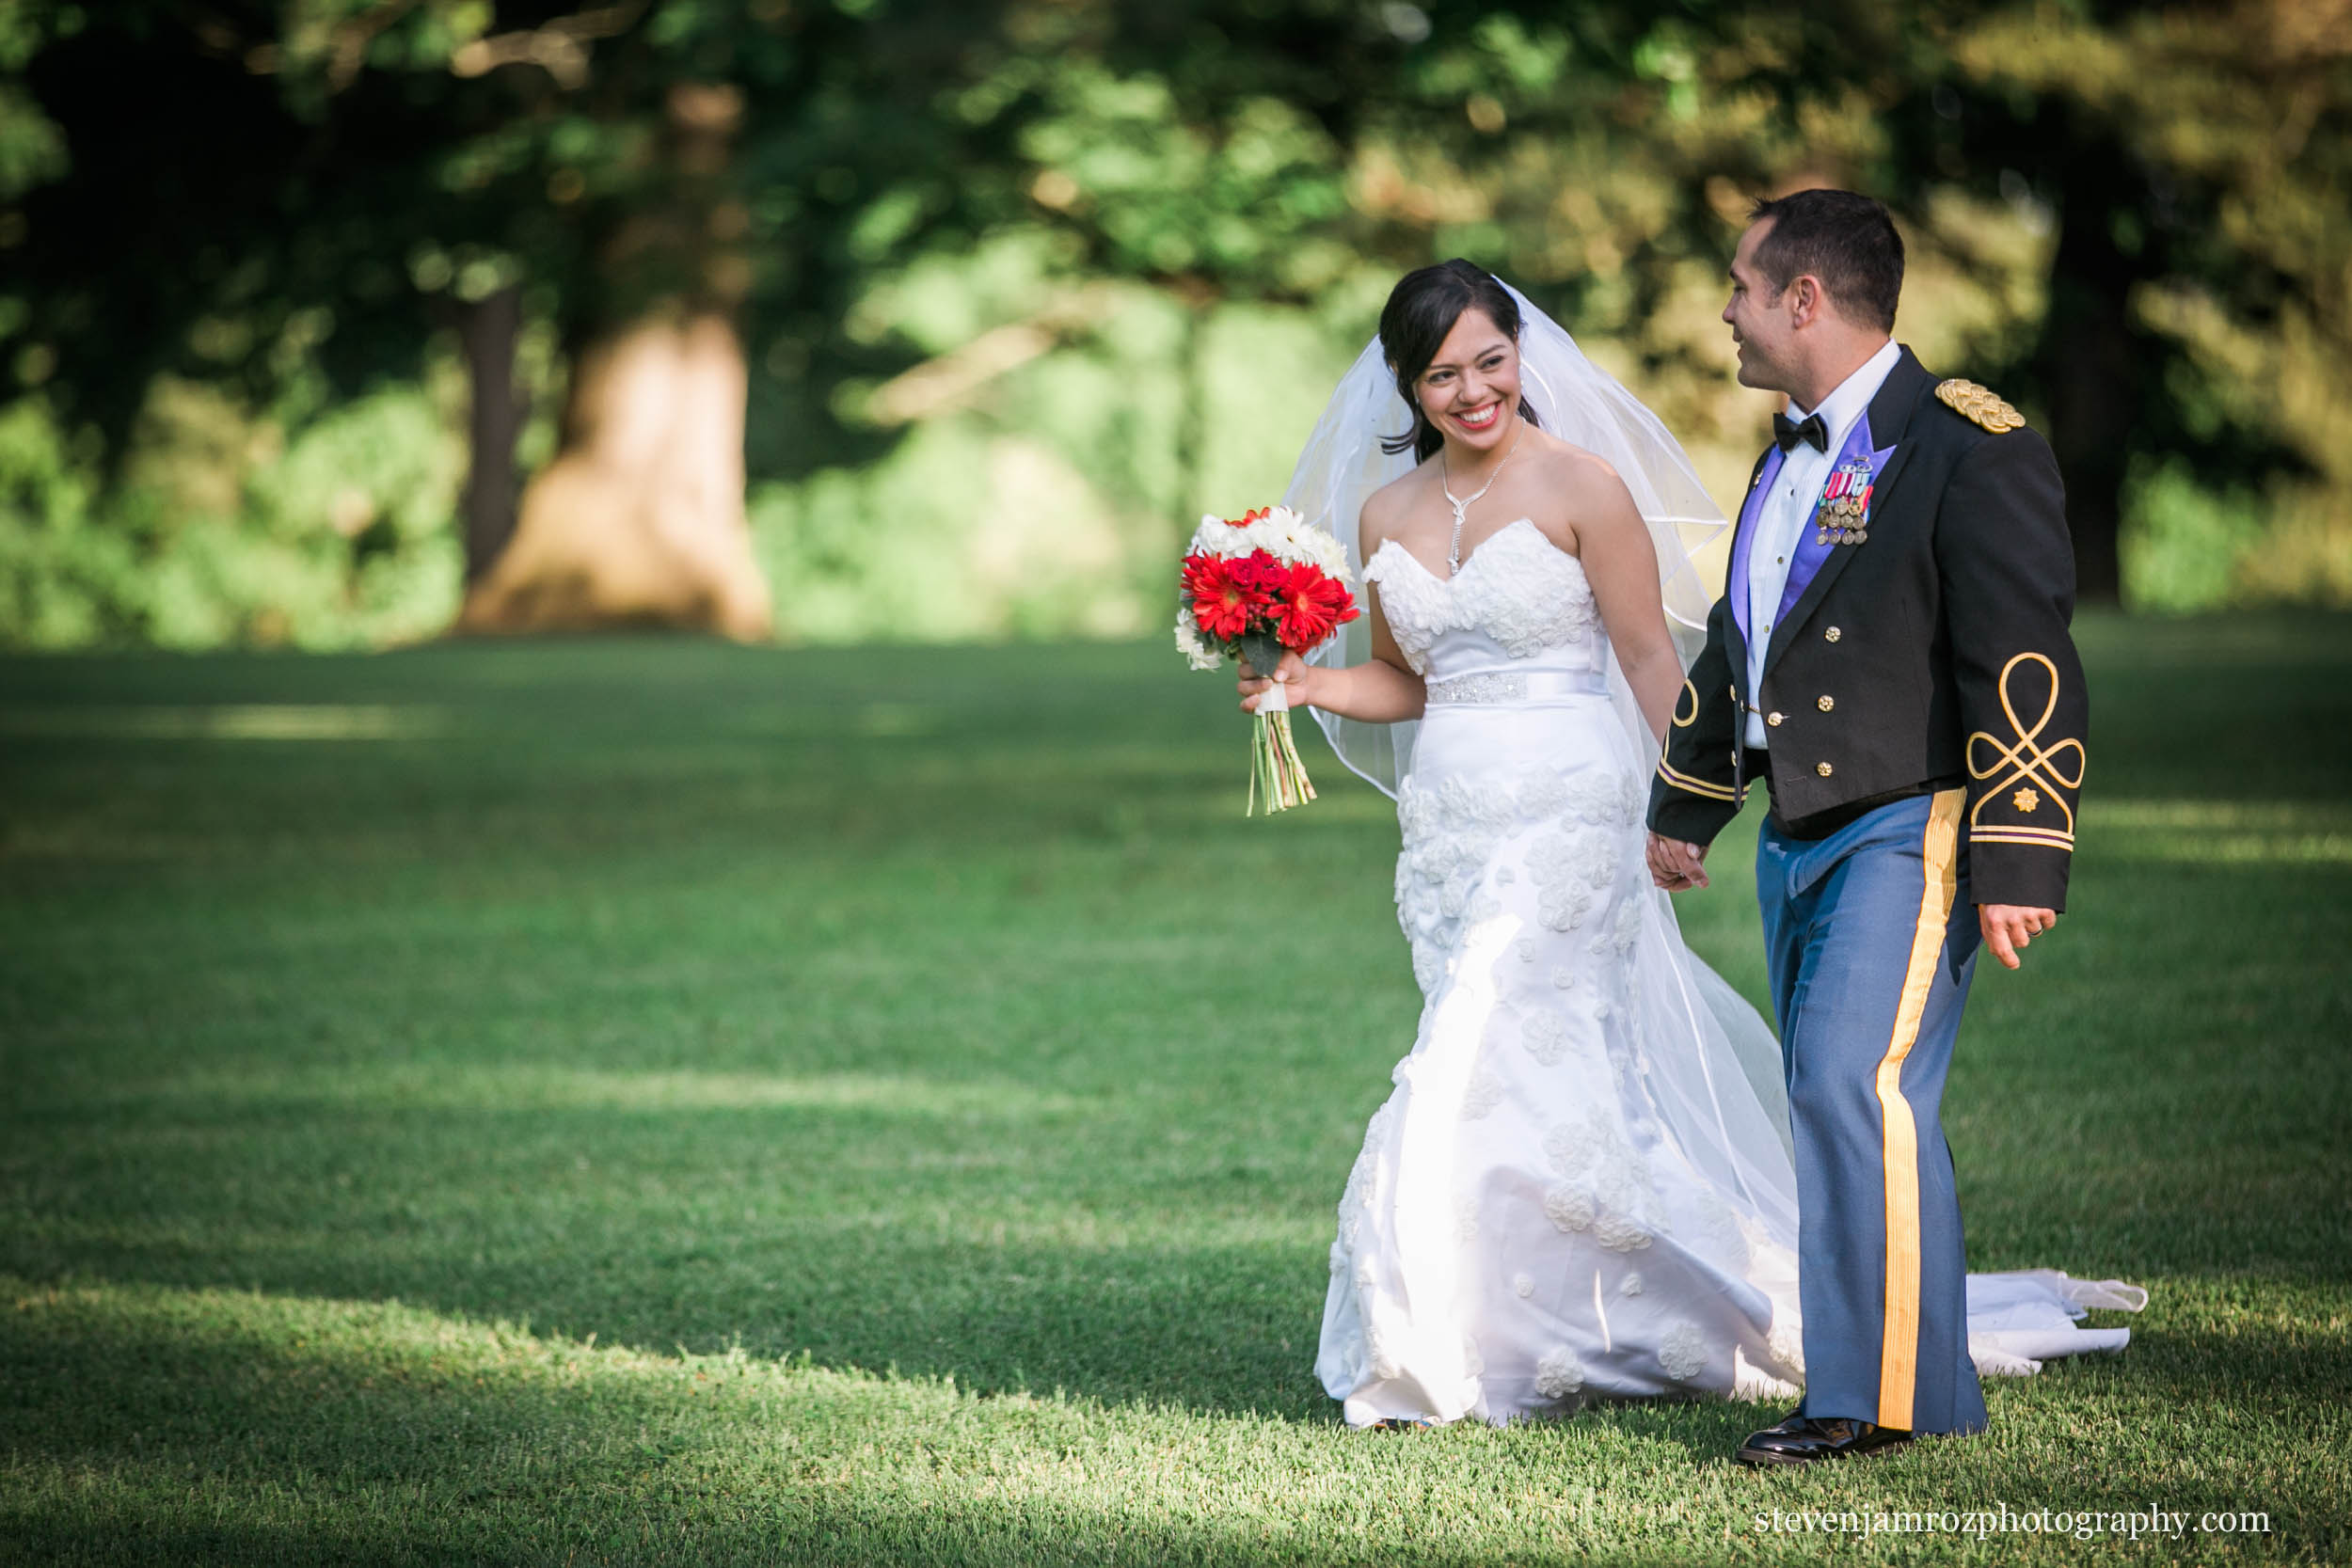 happy-couple-wedding-steven-jamroz-photography-0500.jpg